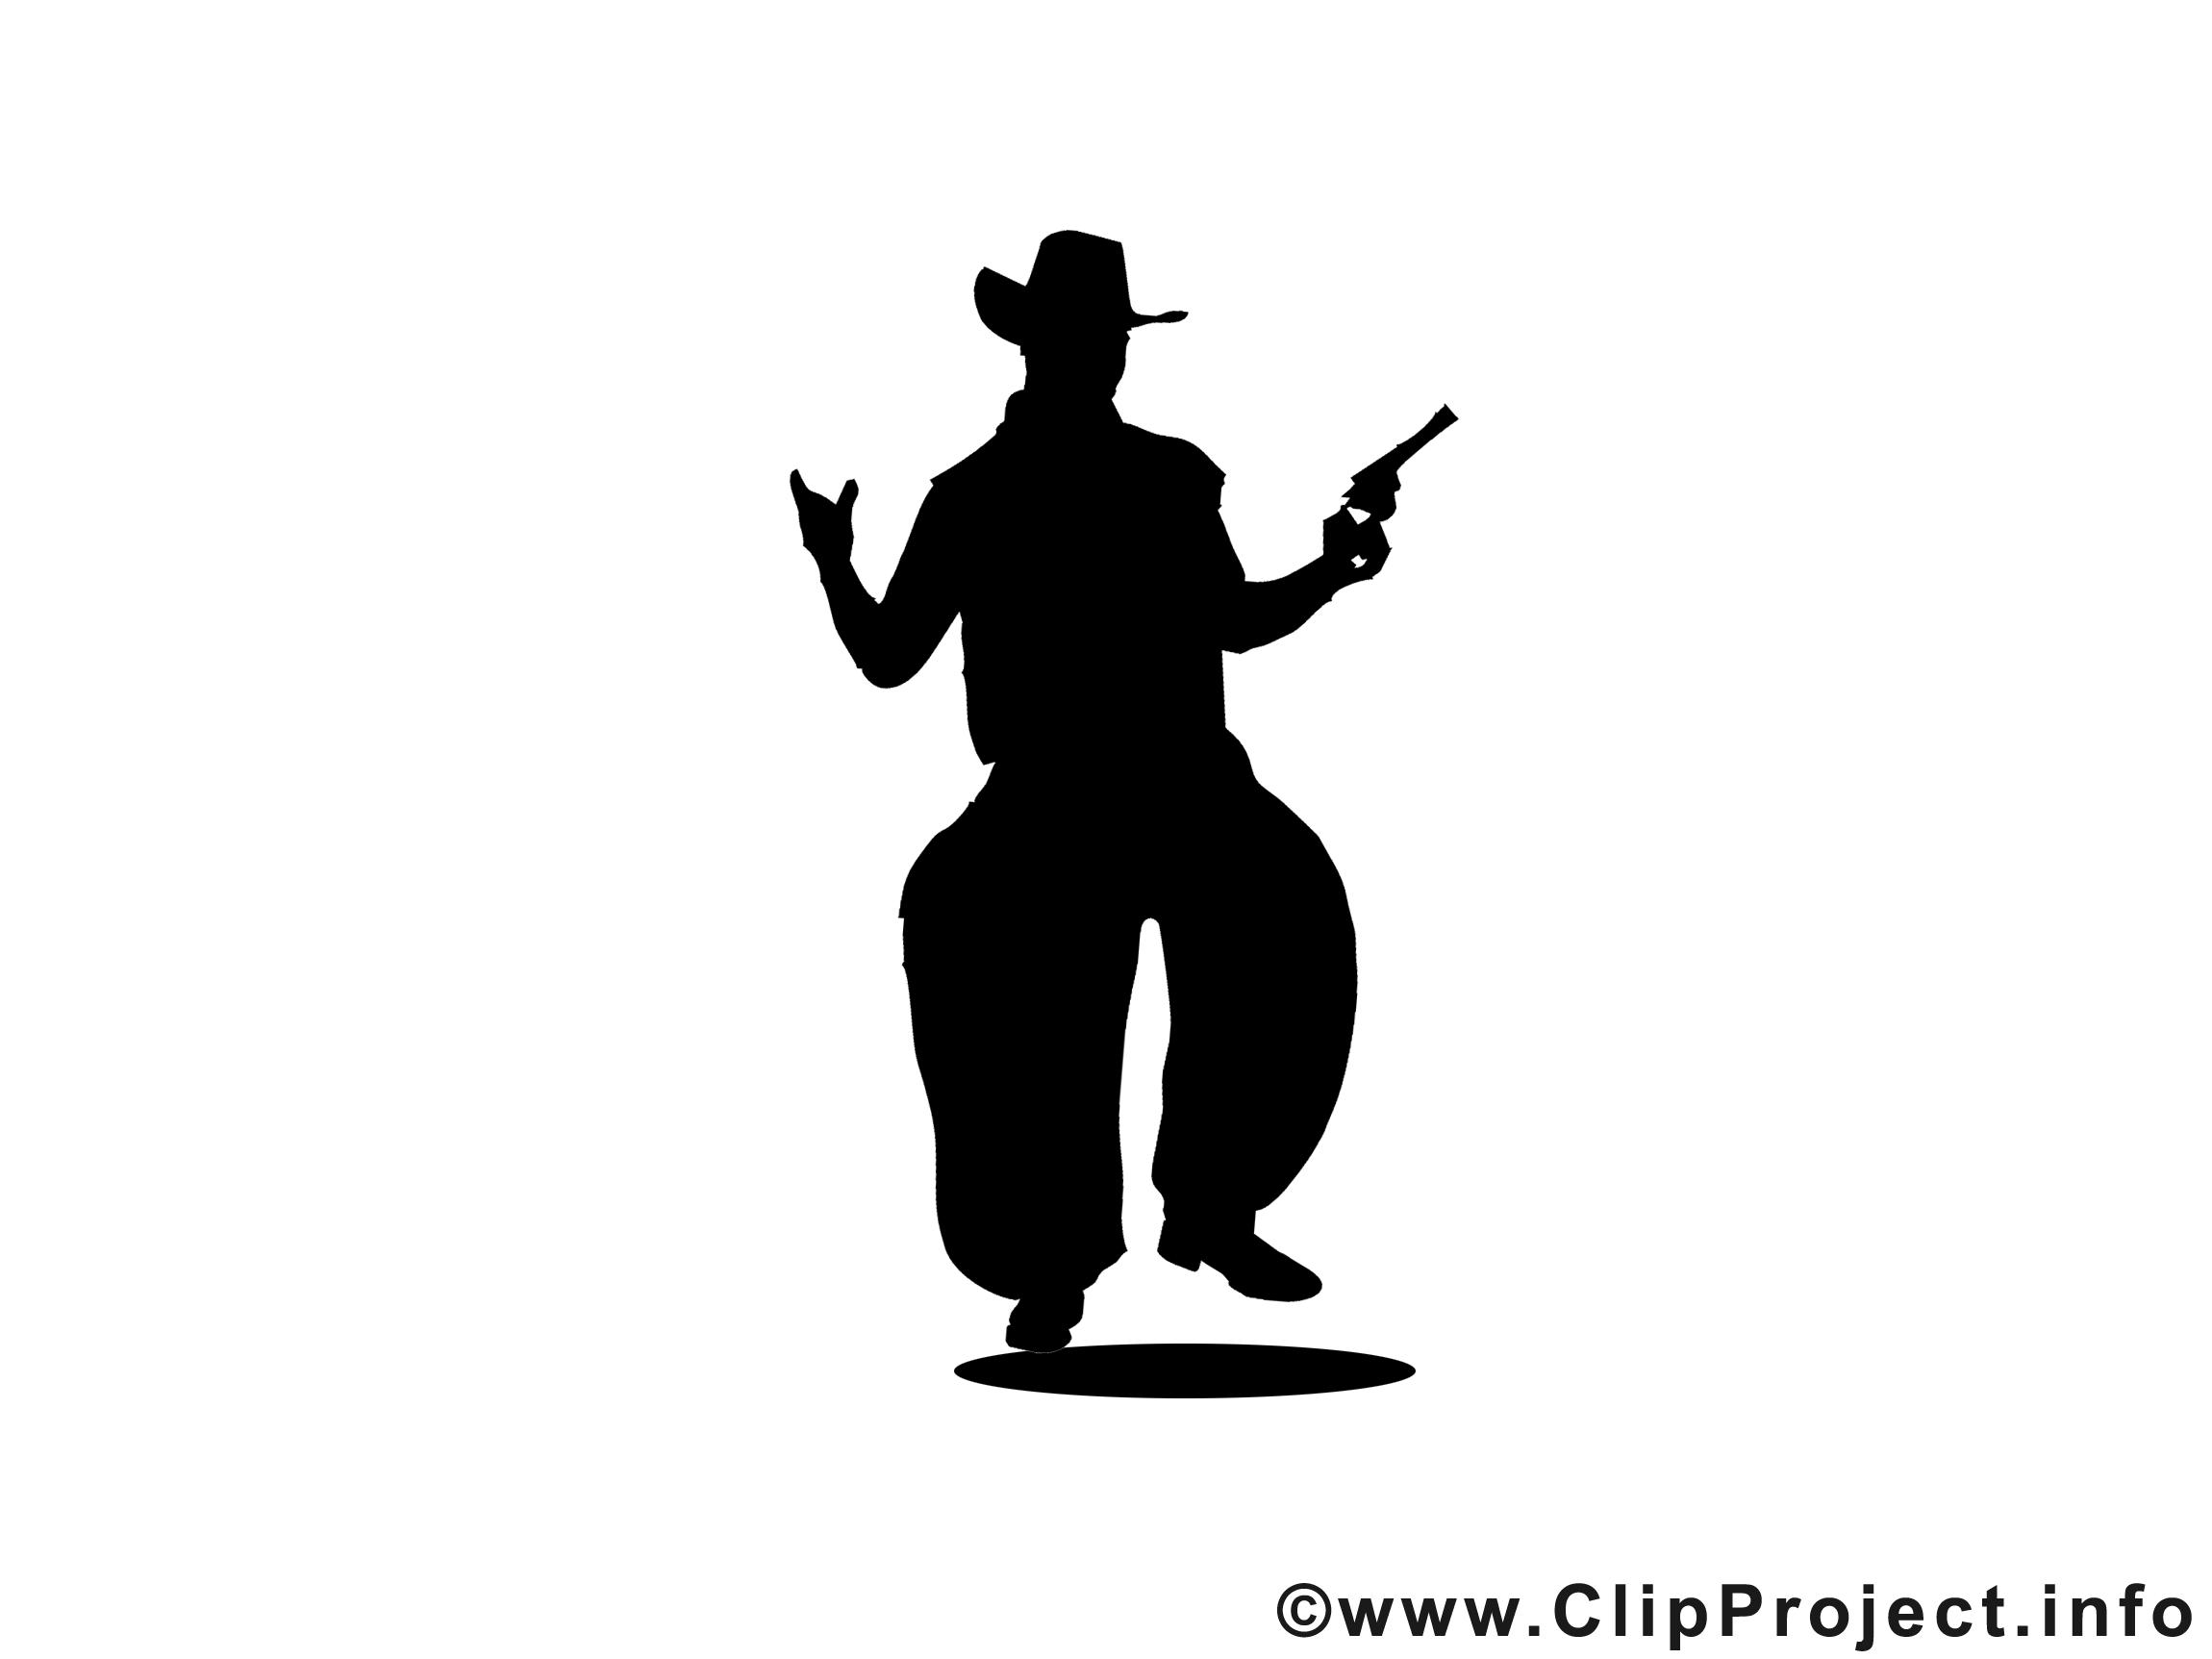 Cowboy profile silhouette clip art - photo#24